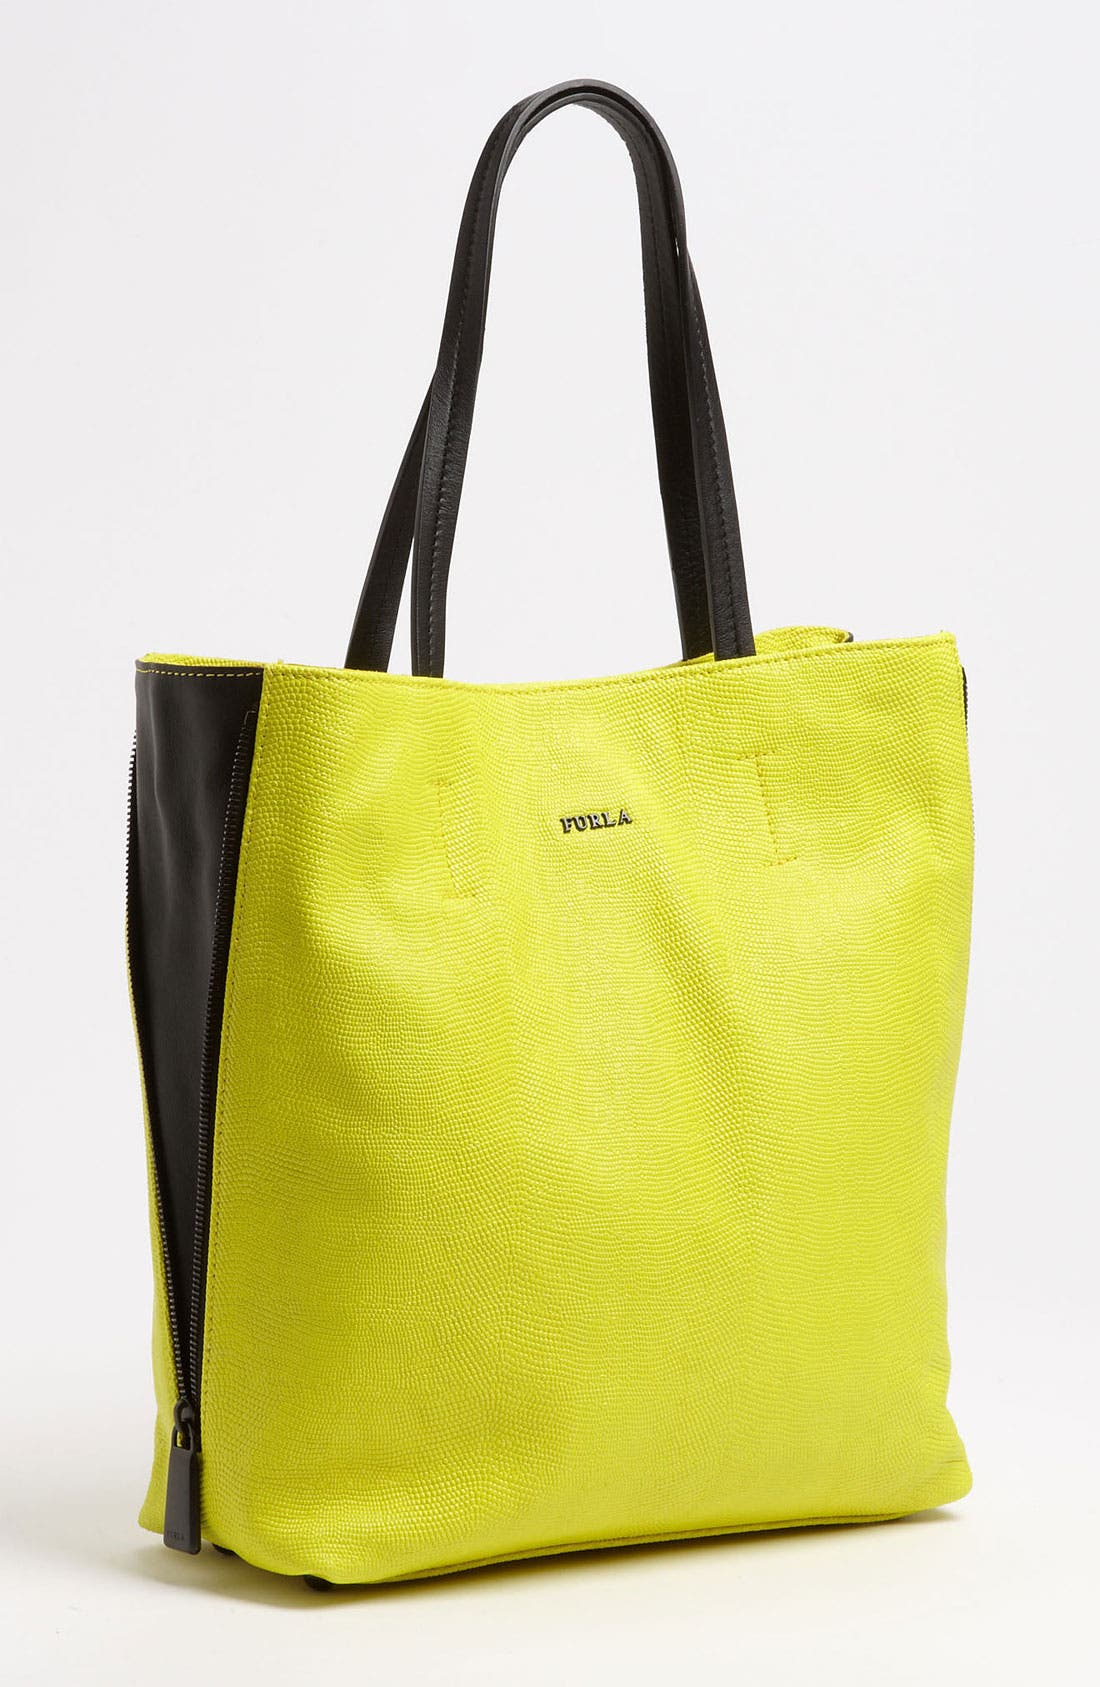 Main Image - Furla 'Amazzone' Shopper